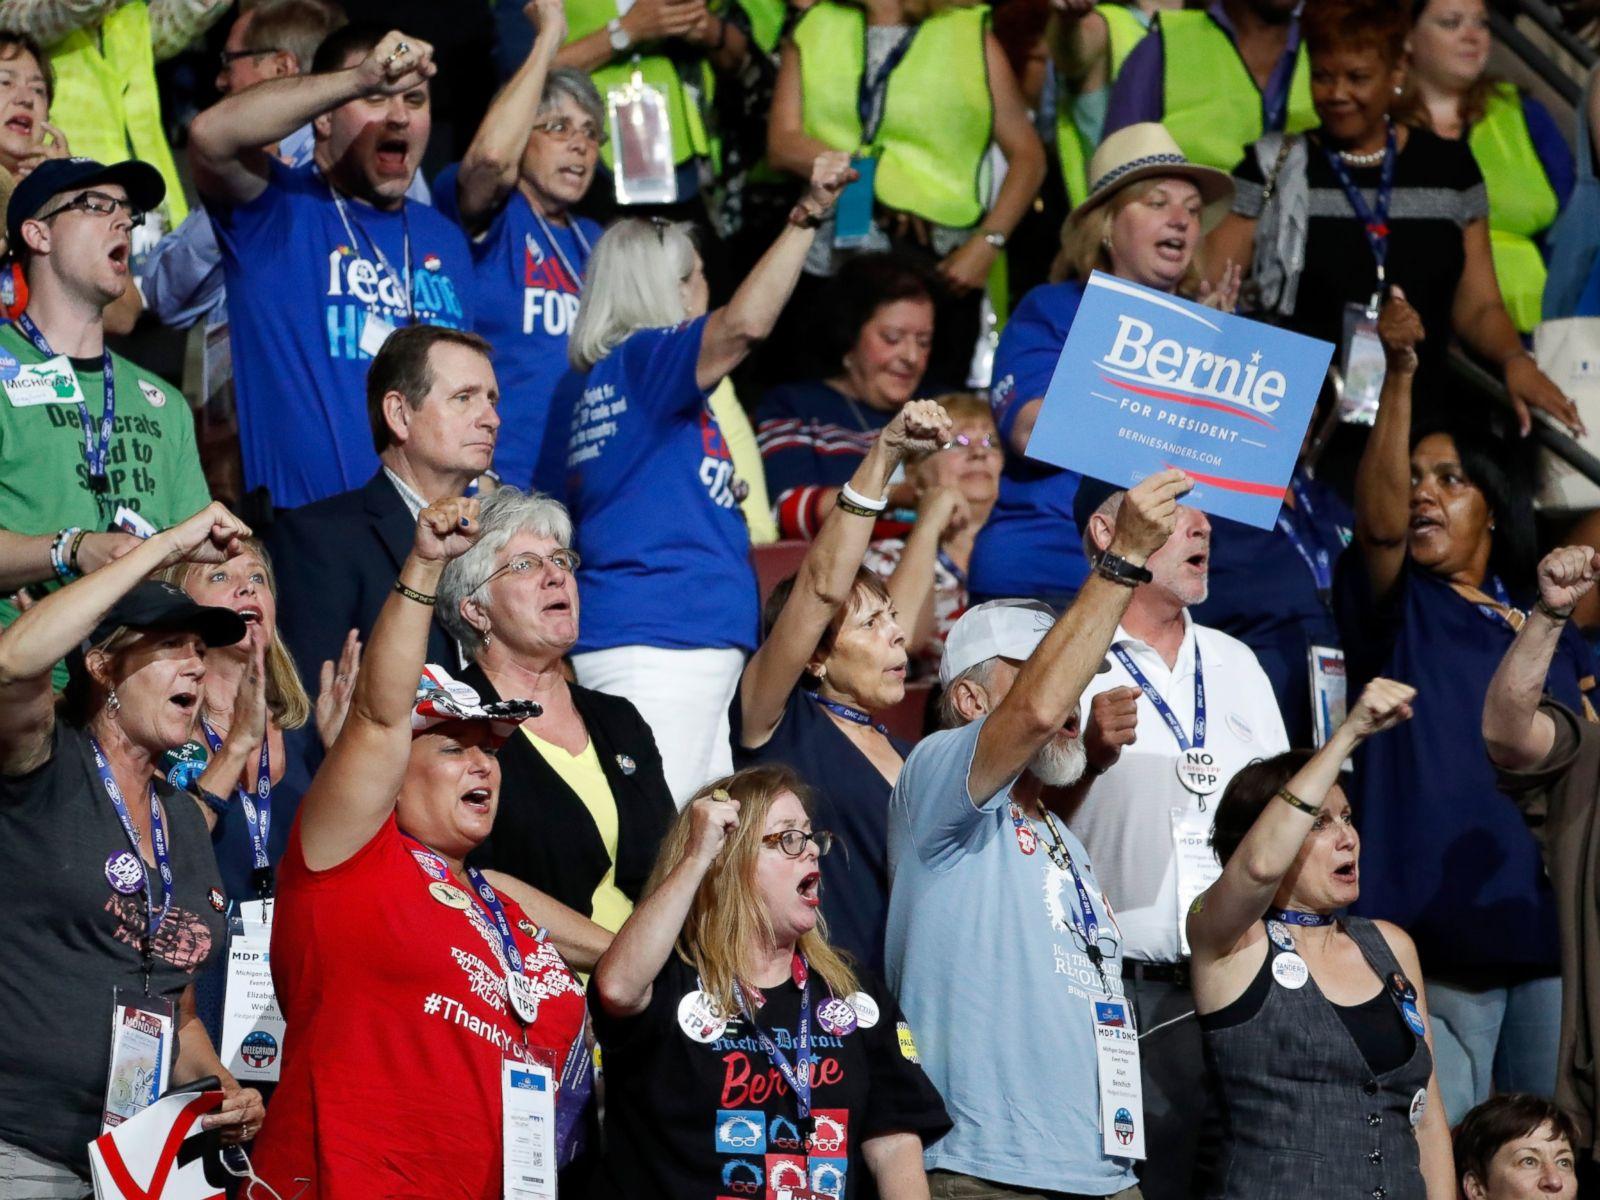 PHOTO: Delegates chant